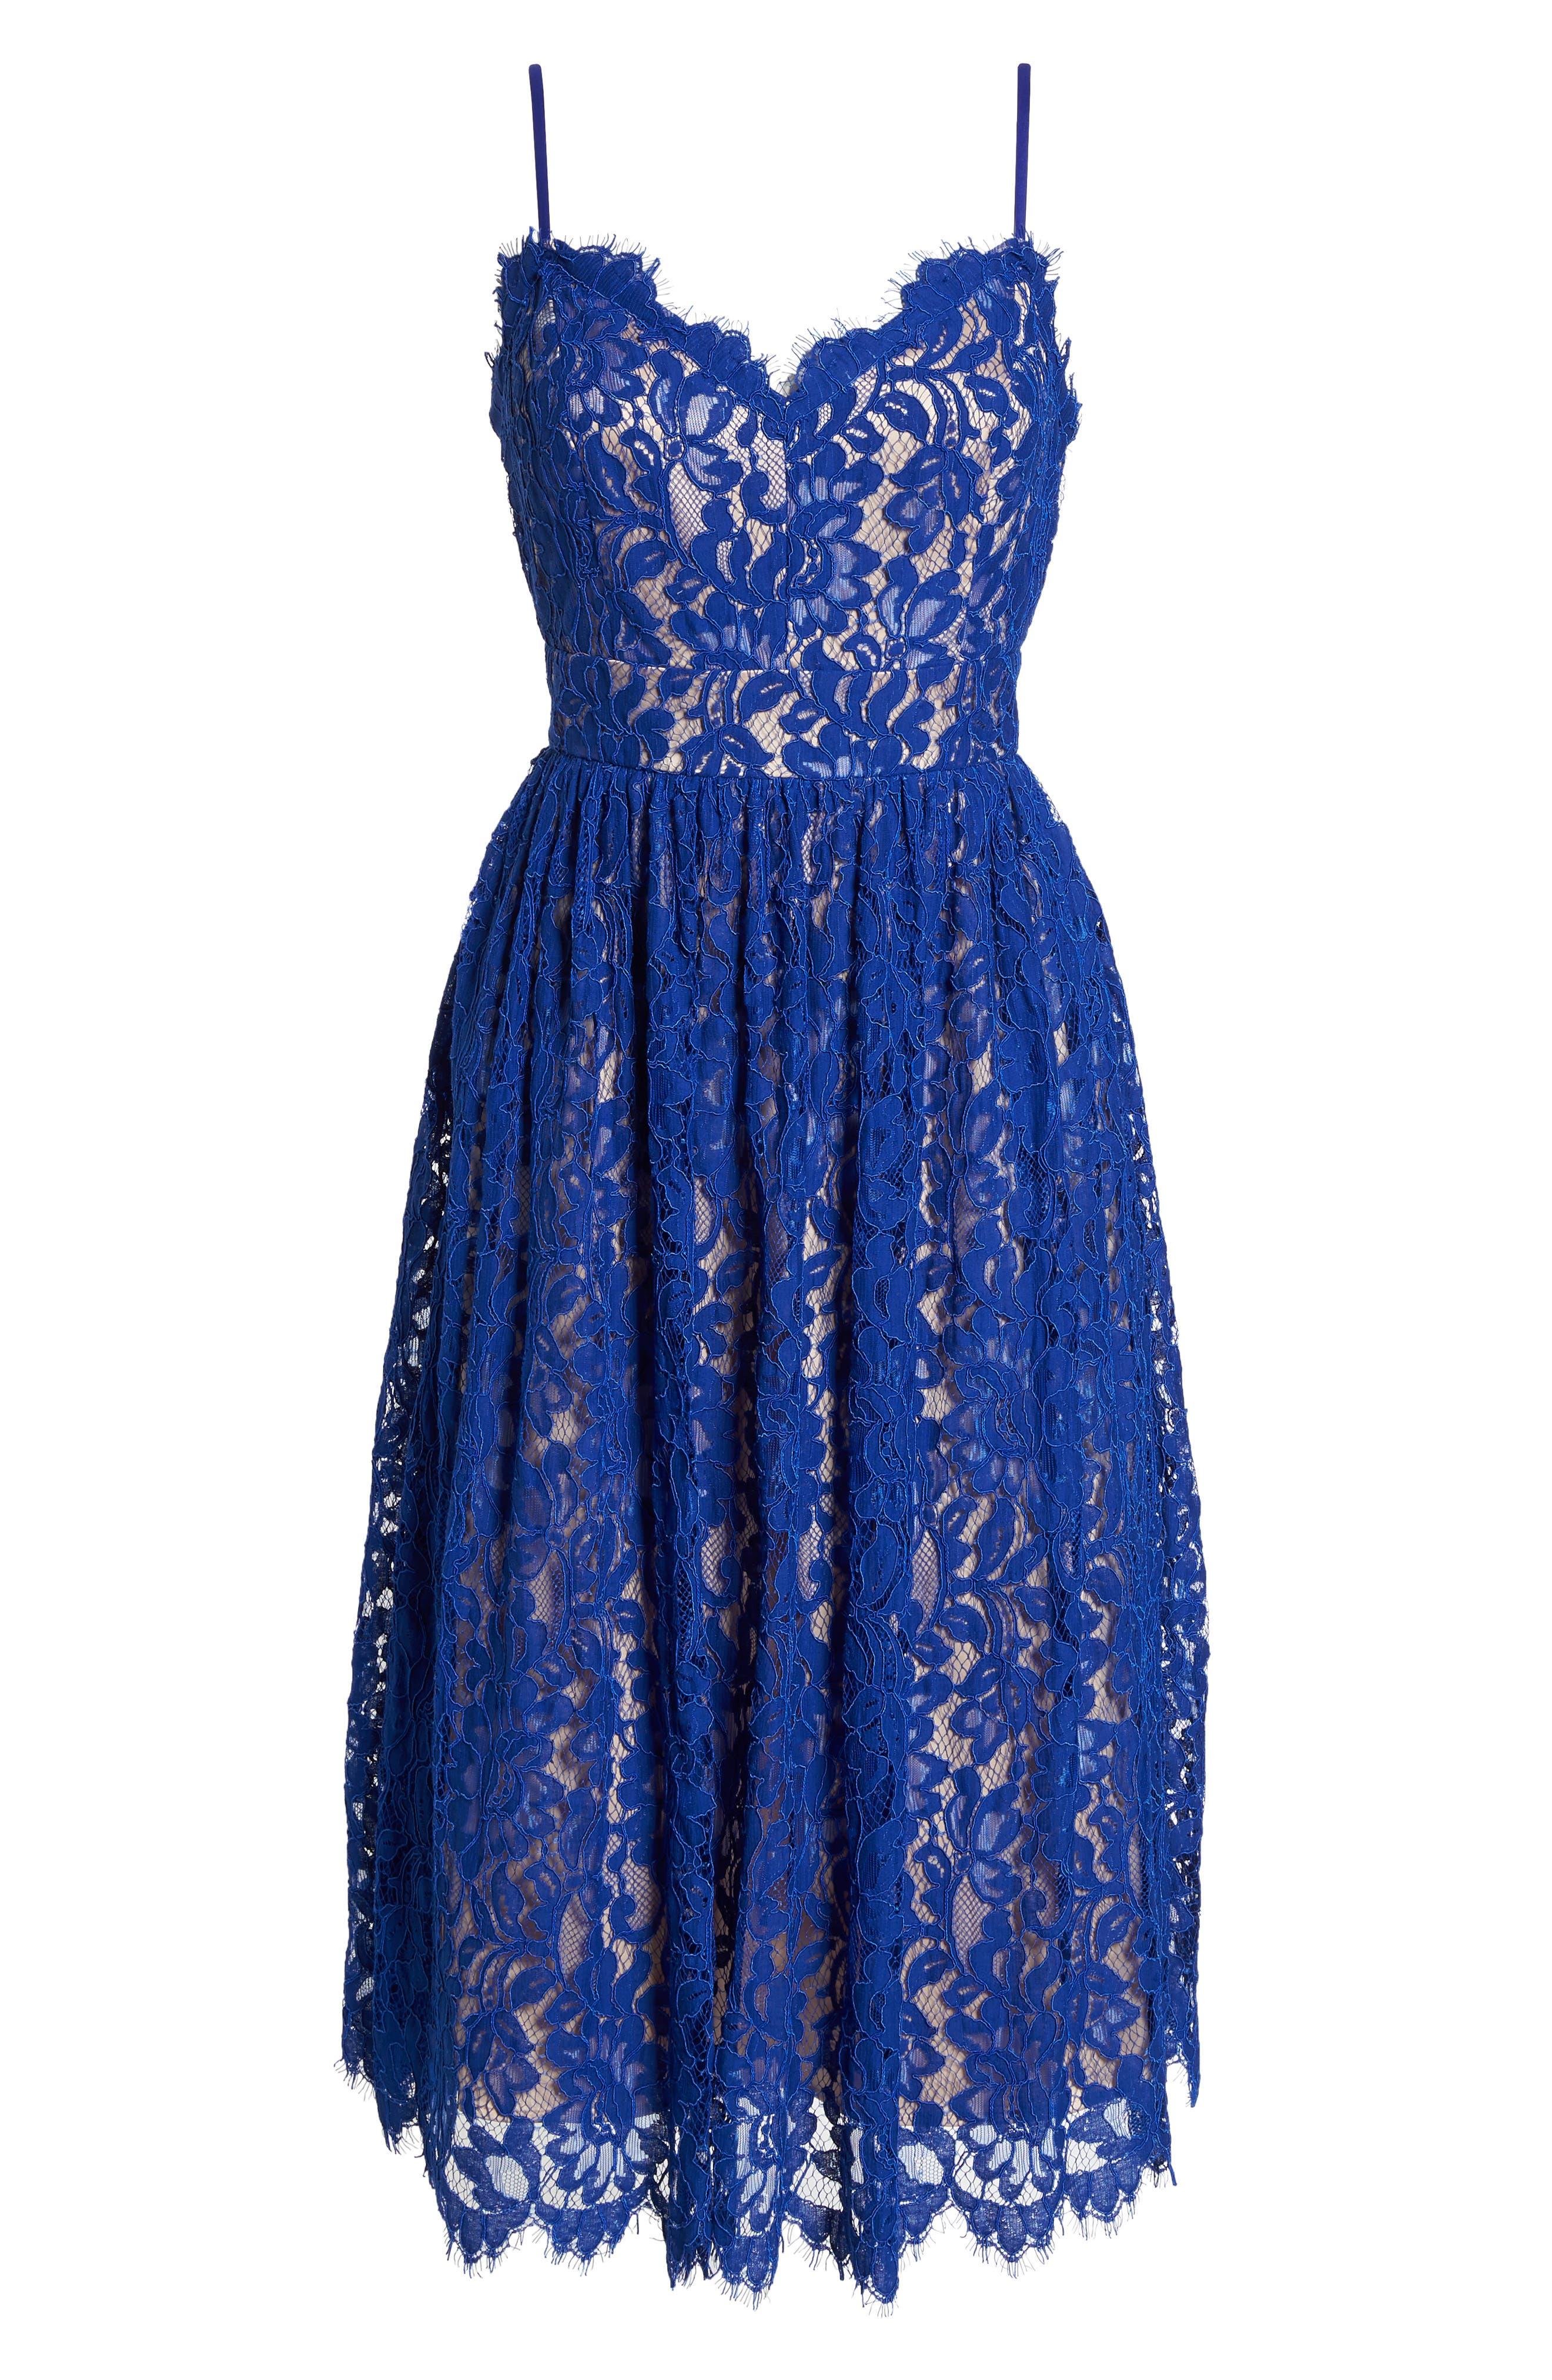 Gathered Lace Midi Dress,                             Alternate thumbnail 7, color,                             Cobalt